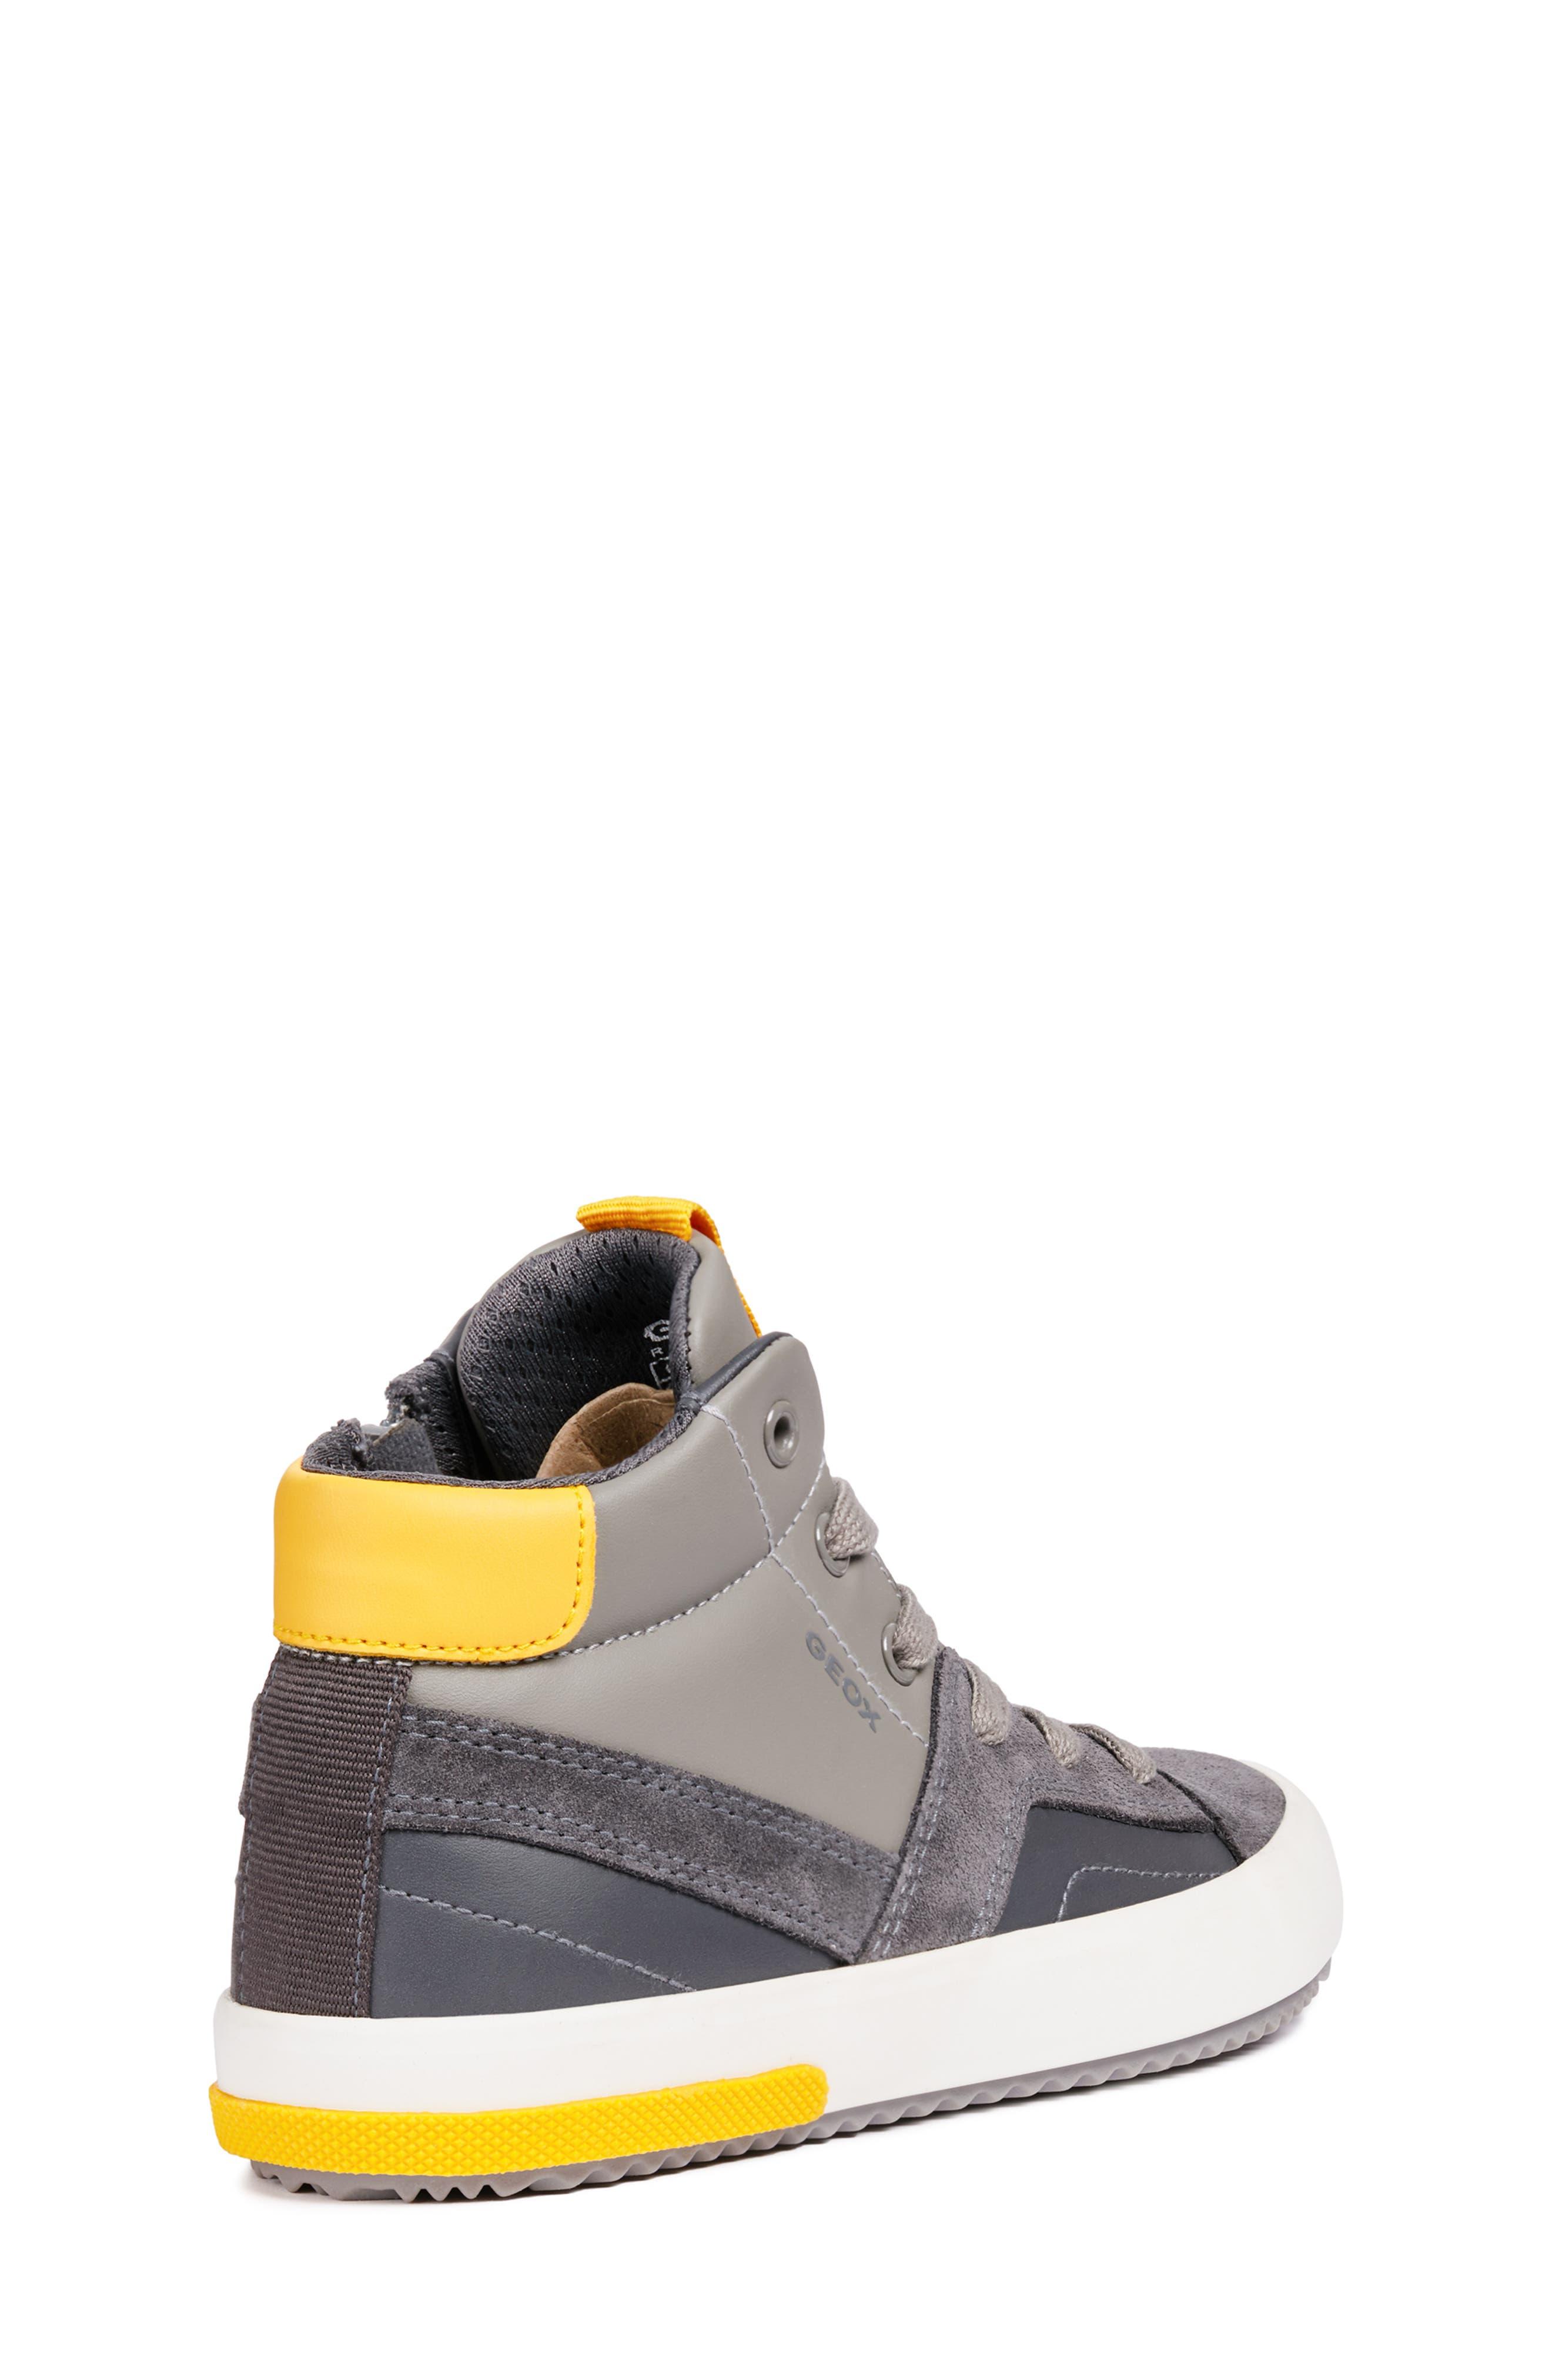 Alonisso 24 High Top Sneaker,                             Alternate thumbnail 6, color,                             DARK GREY/YELLOW